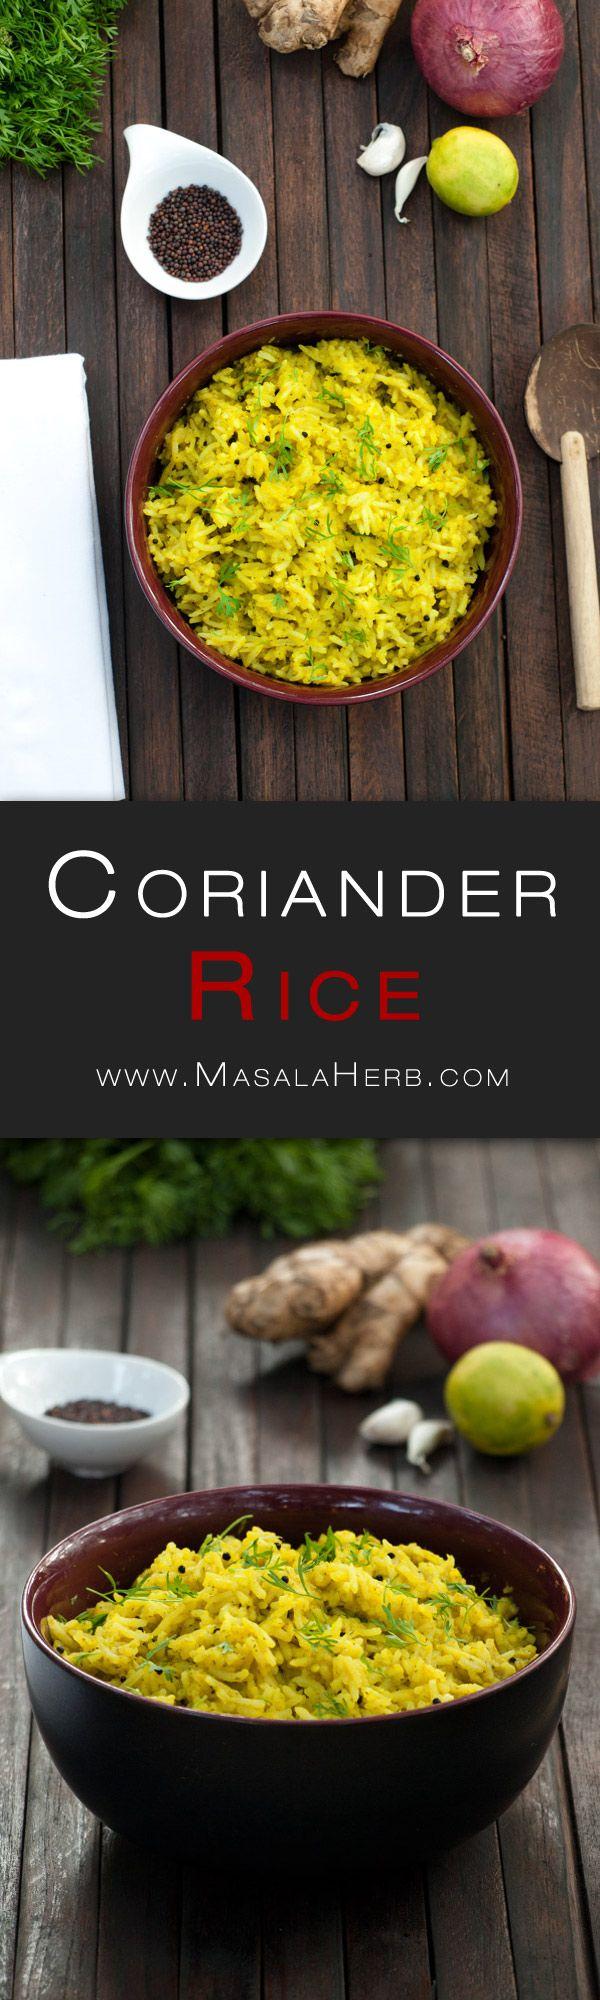 Coriander Rice Recipe – How to make Coriander Rice – Cilantro Rice www.MasalaHerb.com #Recipe #Indianfood #spicy